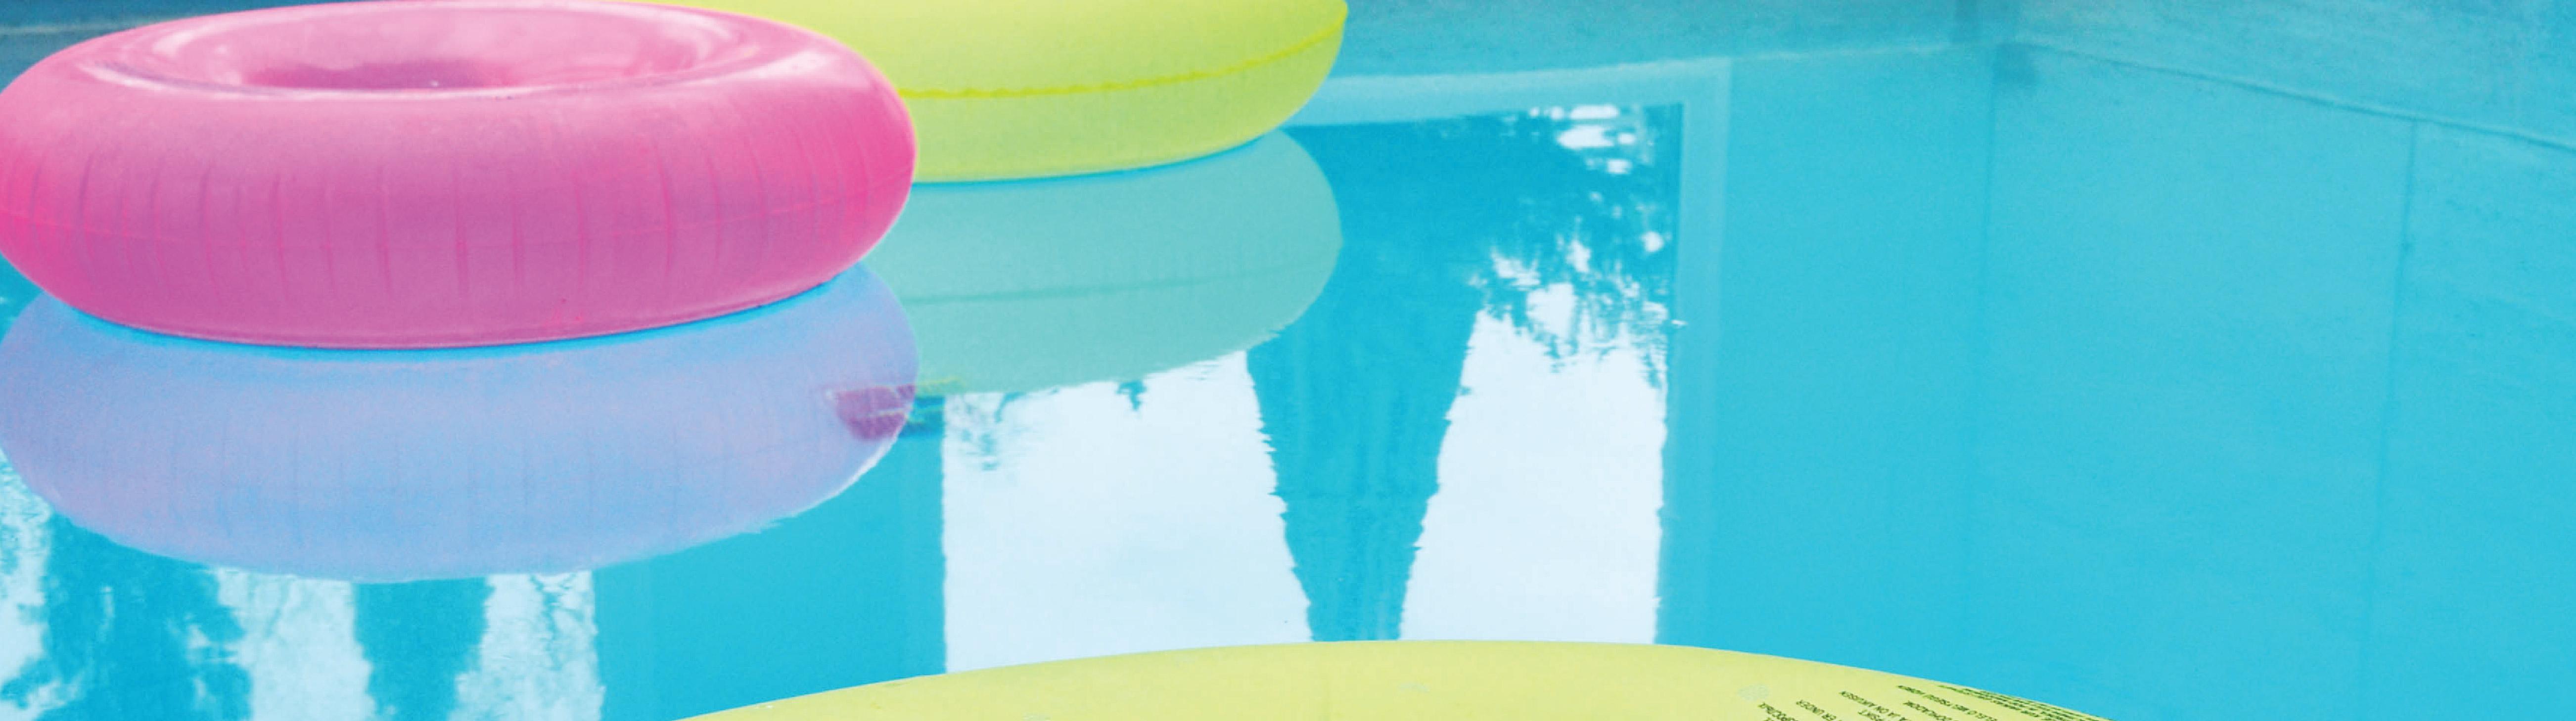 banners_internos-piscina-aquecida-01